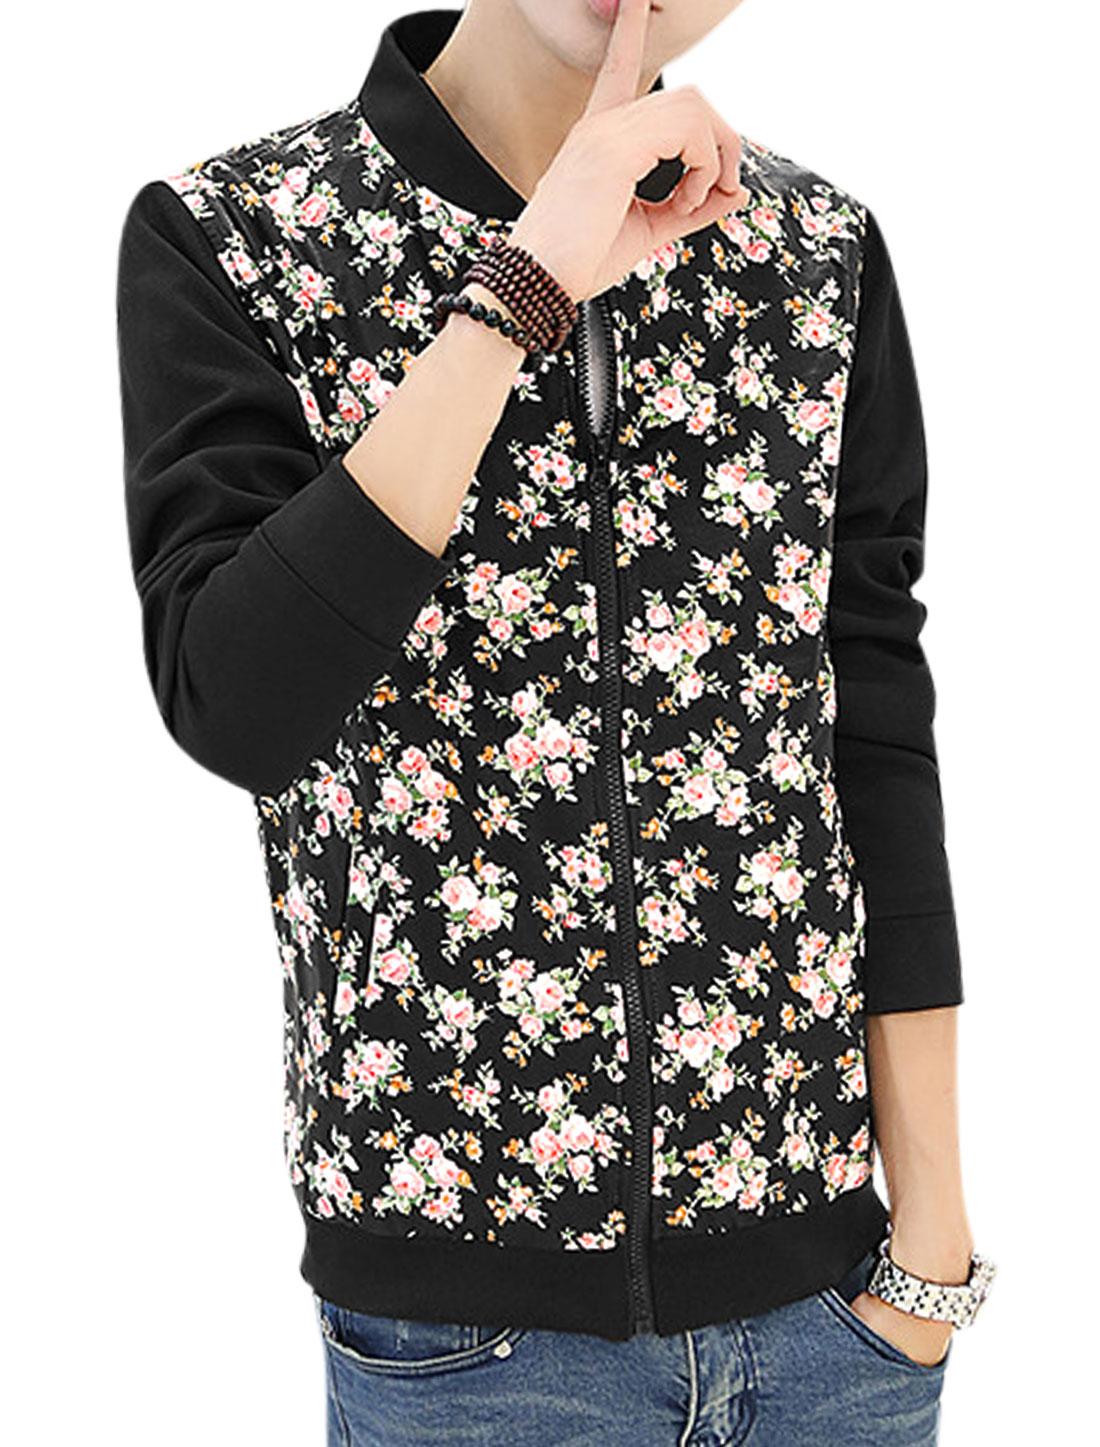 Men Stand Collar Long Sleeves Full Zip Panel Trendy Jacket Black S